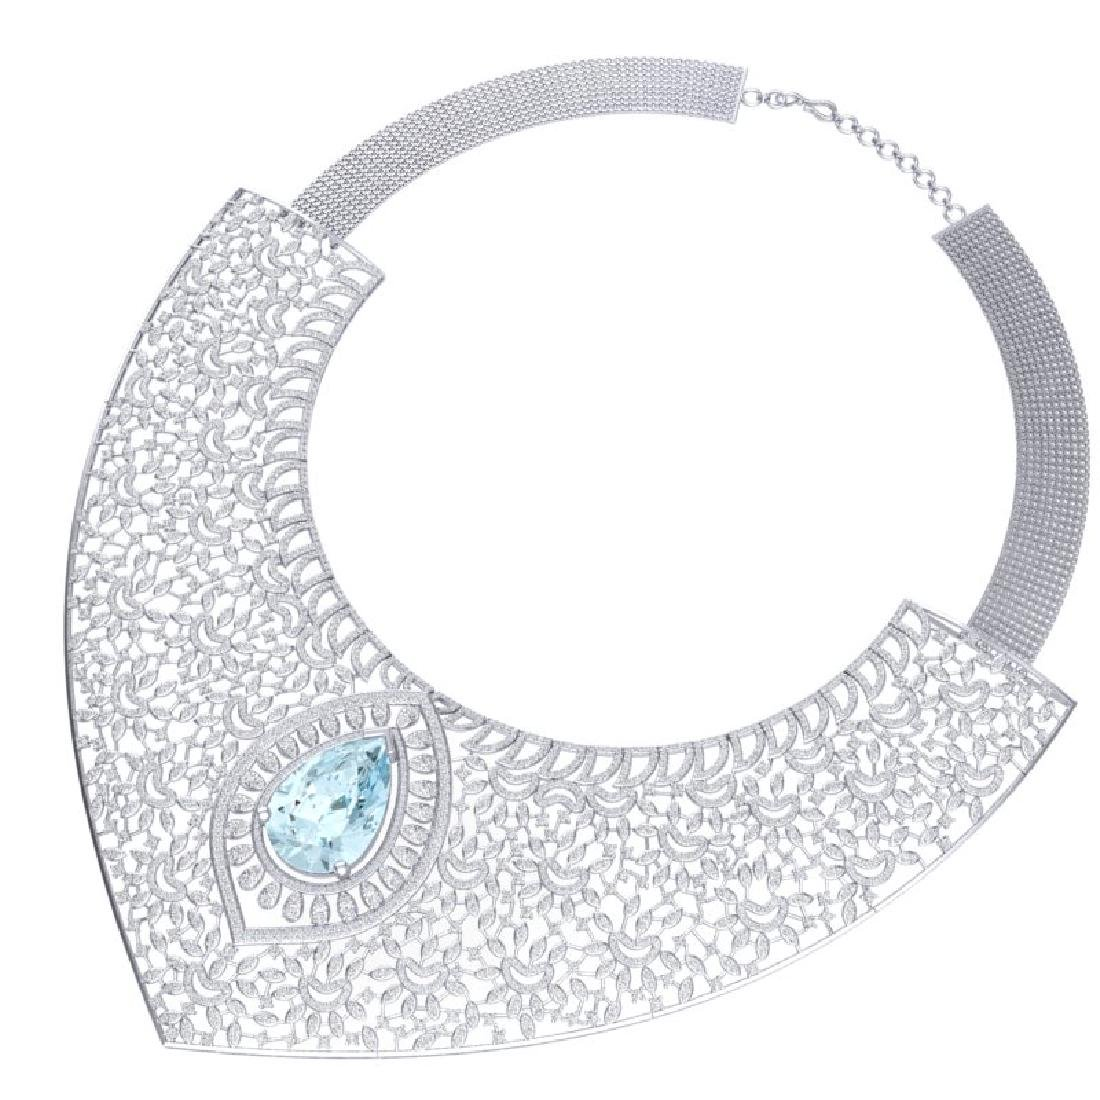 63.27 CTW Royalty Sky Topaz & VS Diamond Necklace 18K - 3